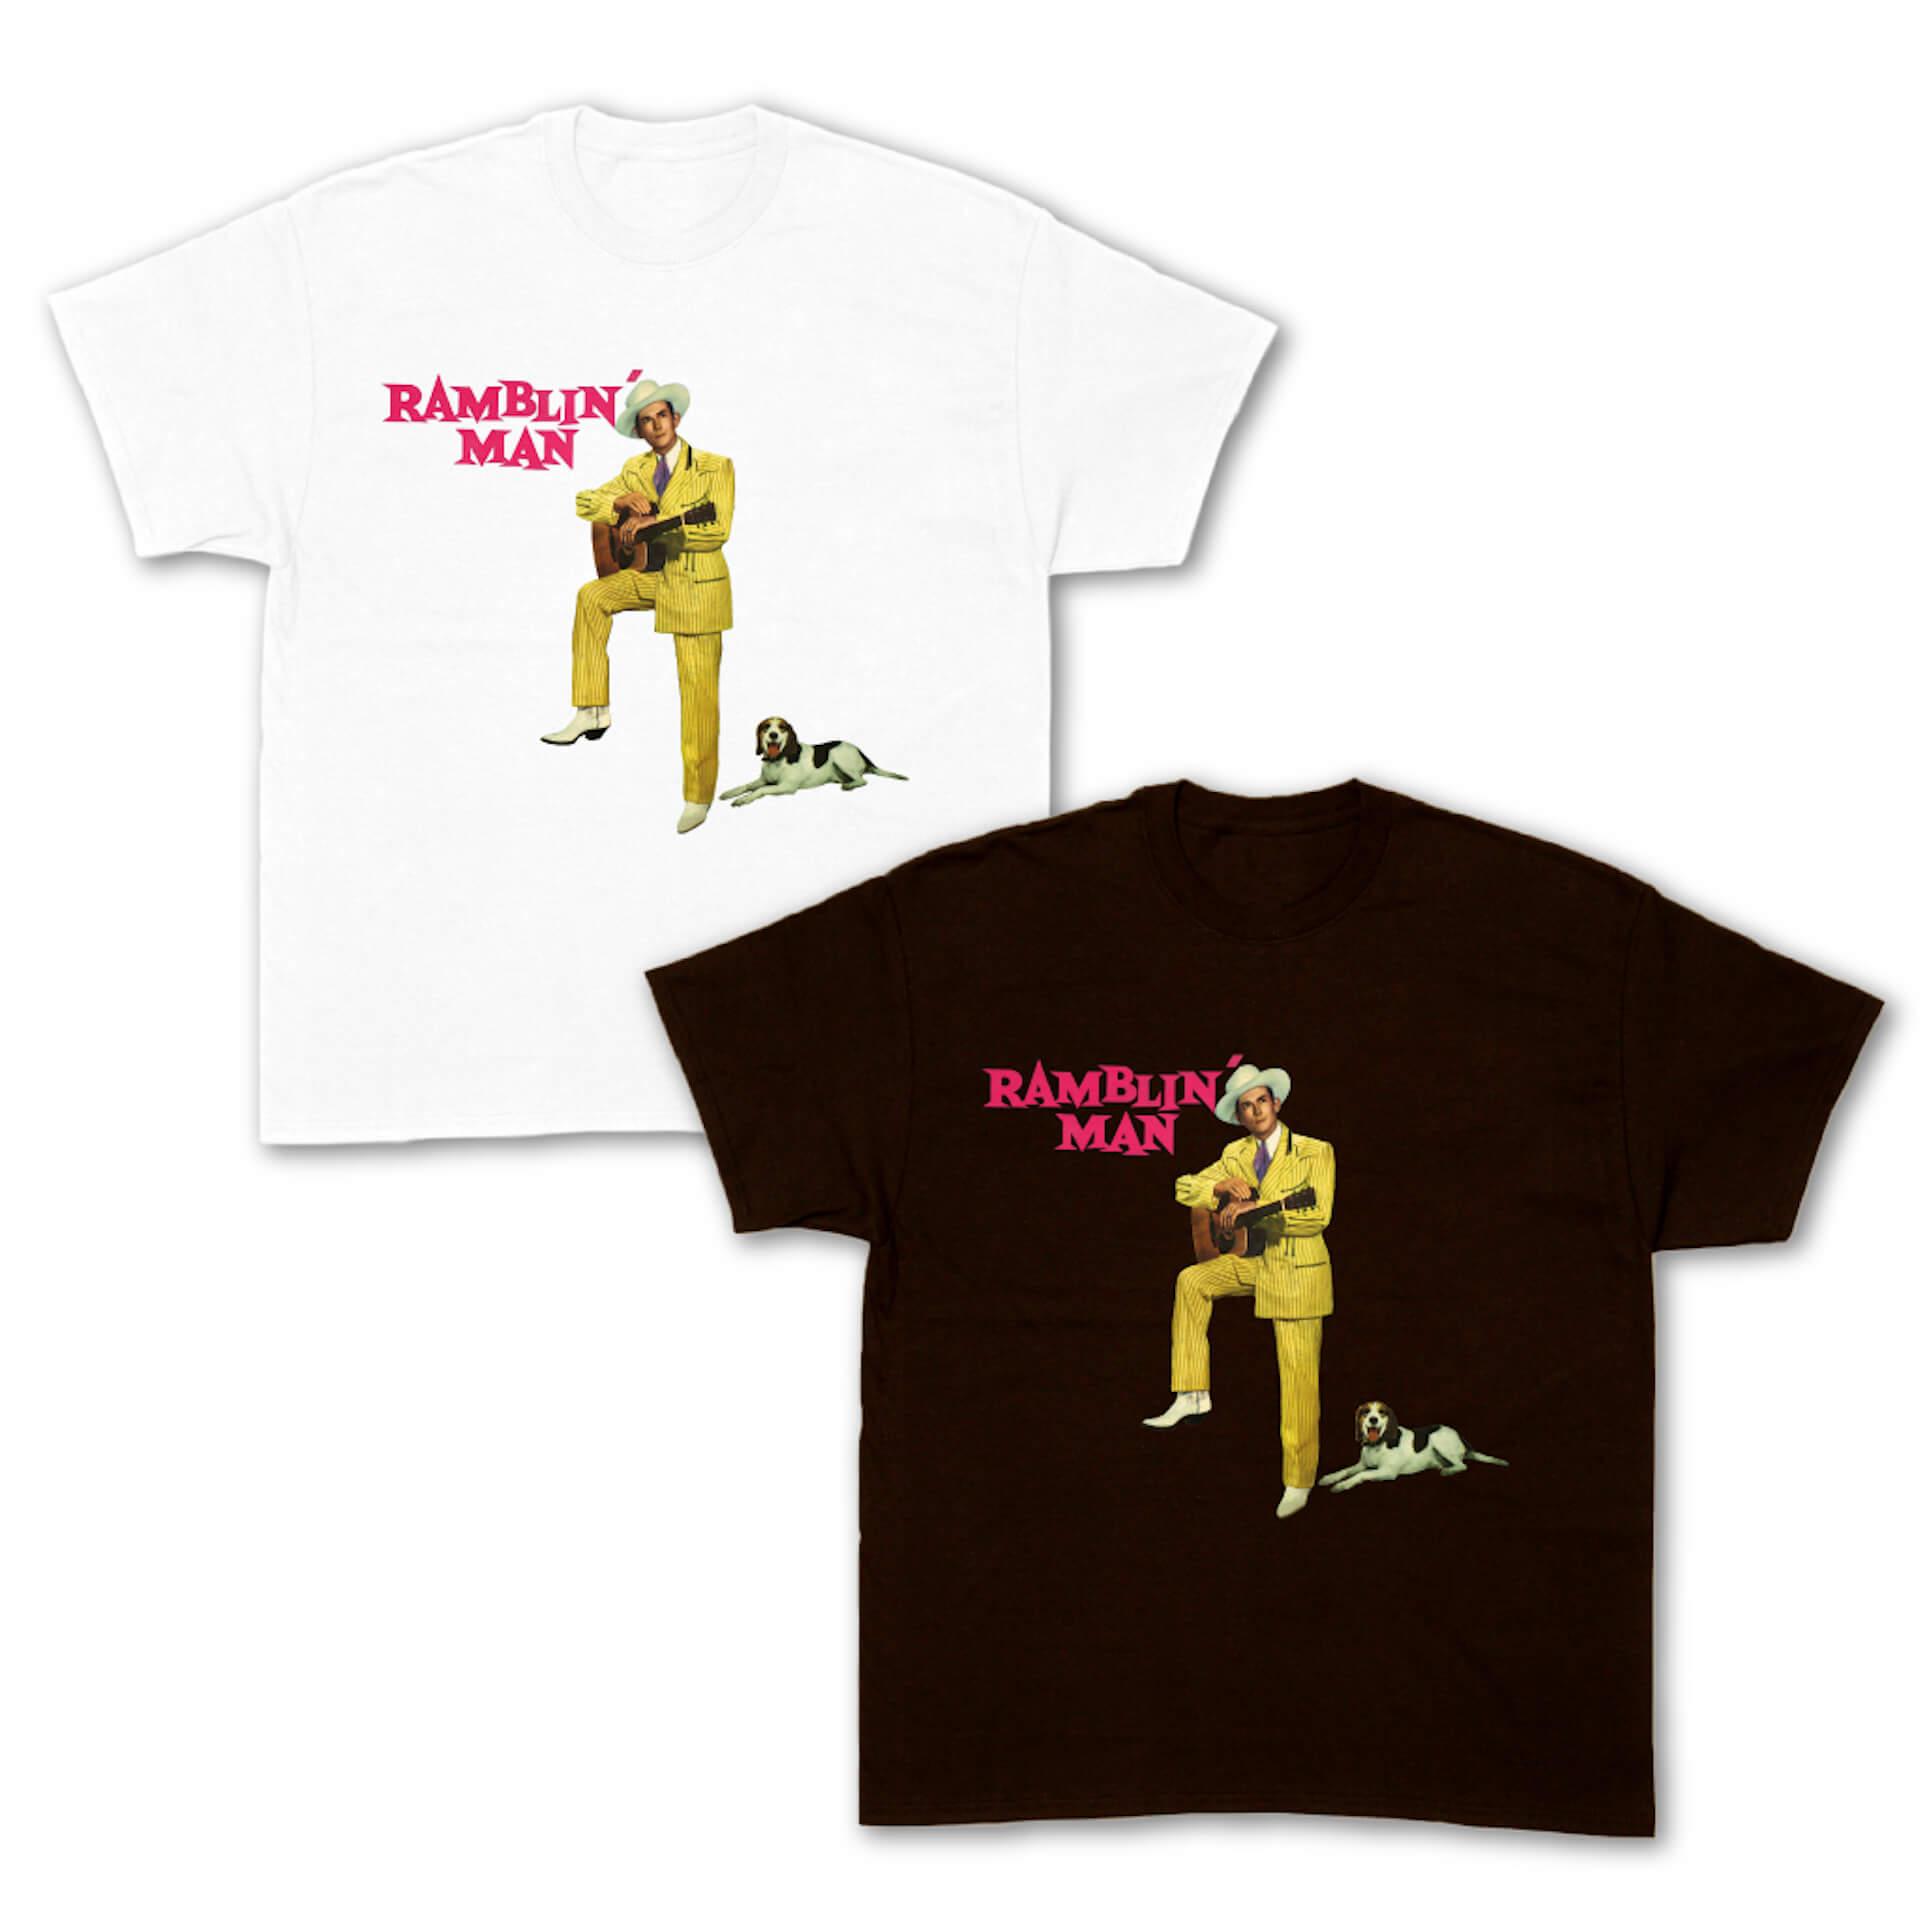 Contact Tokyo&SOUND MUSEUM VISIONのオリジナルデザインTシャツが発売決定!野村訓市、UNDERCOVER、VERDY、YAGIが参加 life210713_contact_vision_6